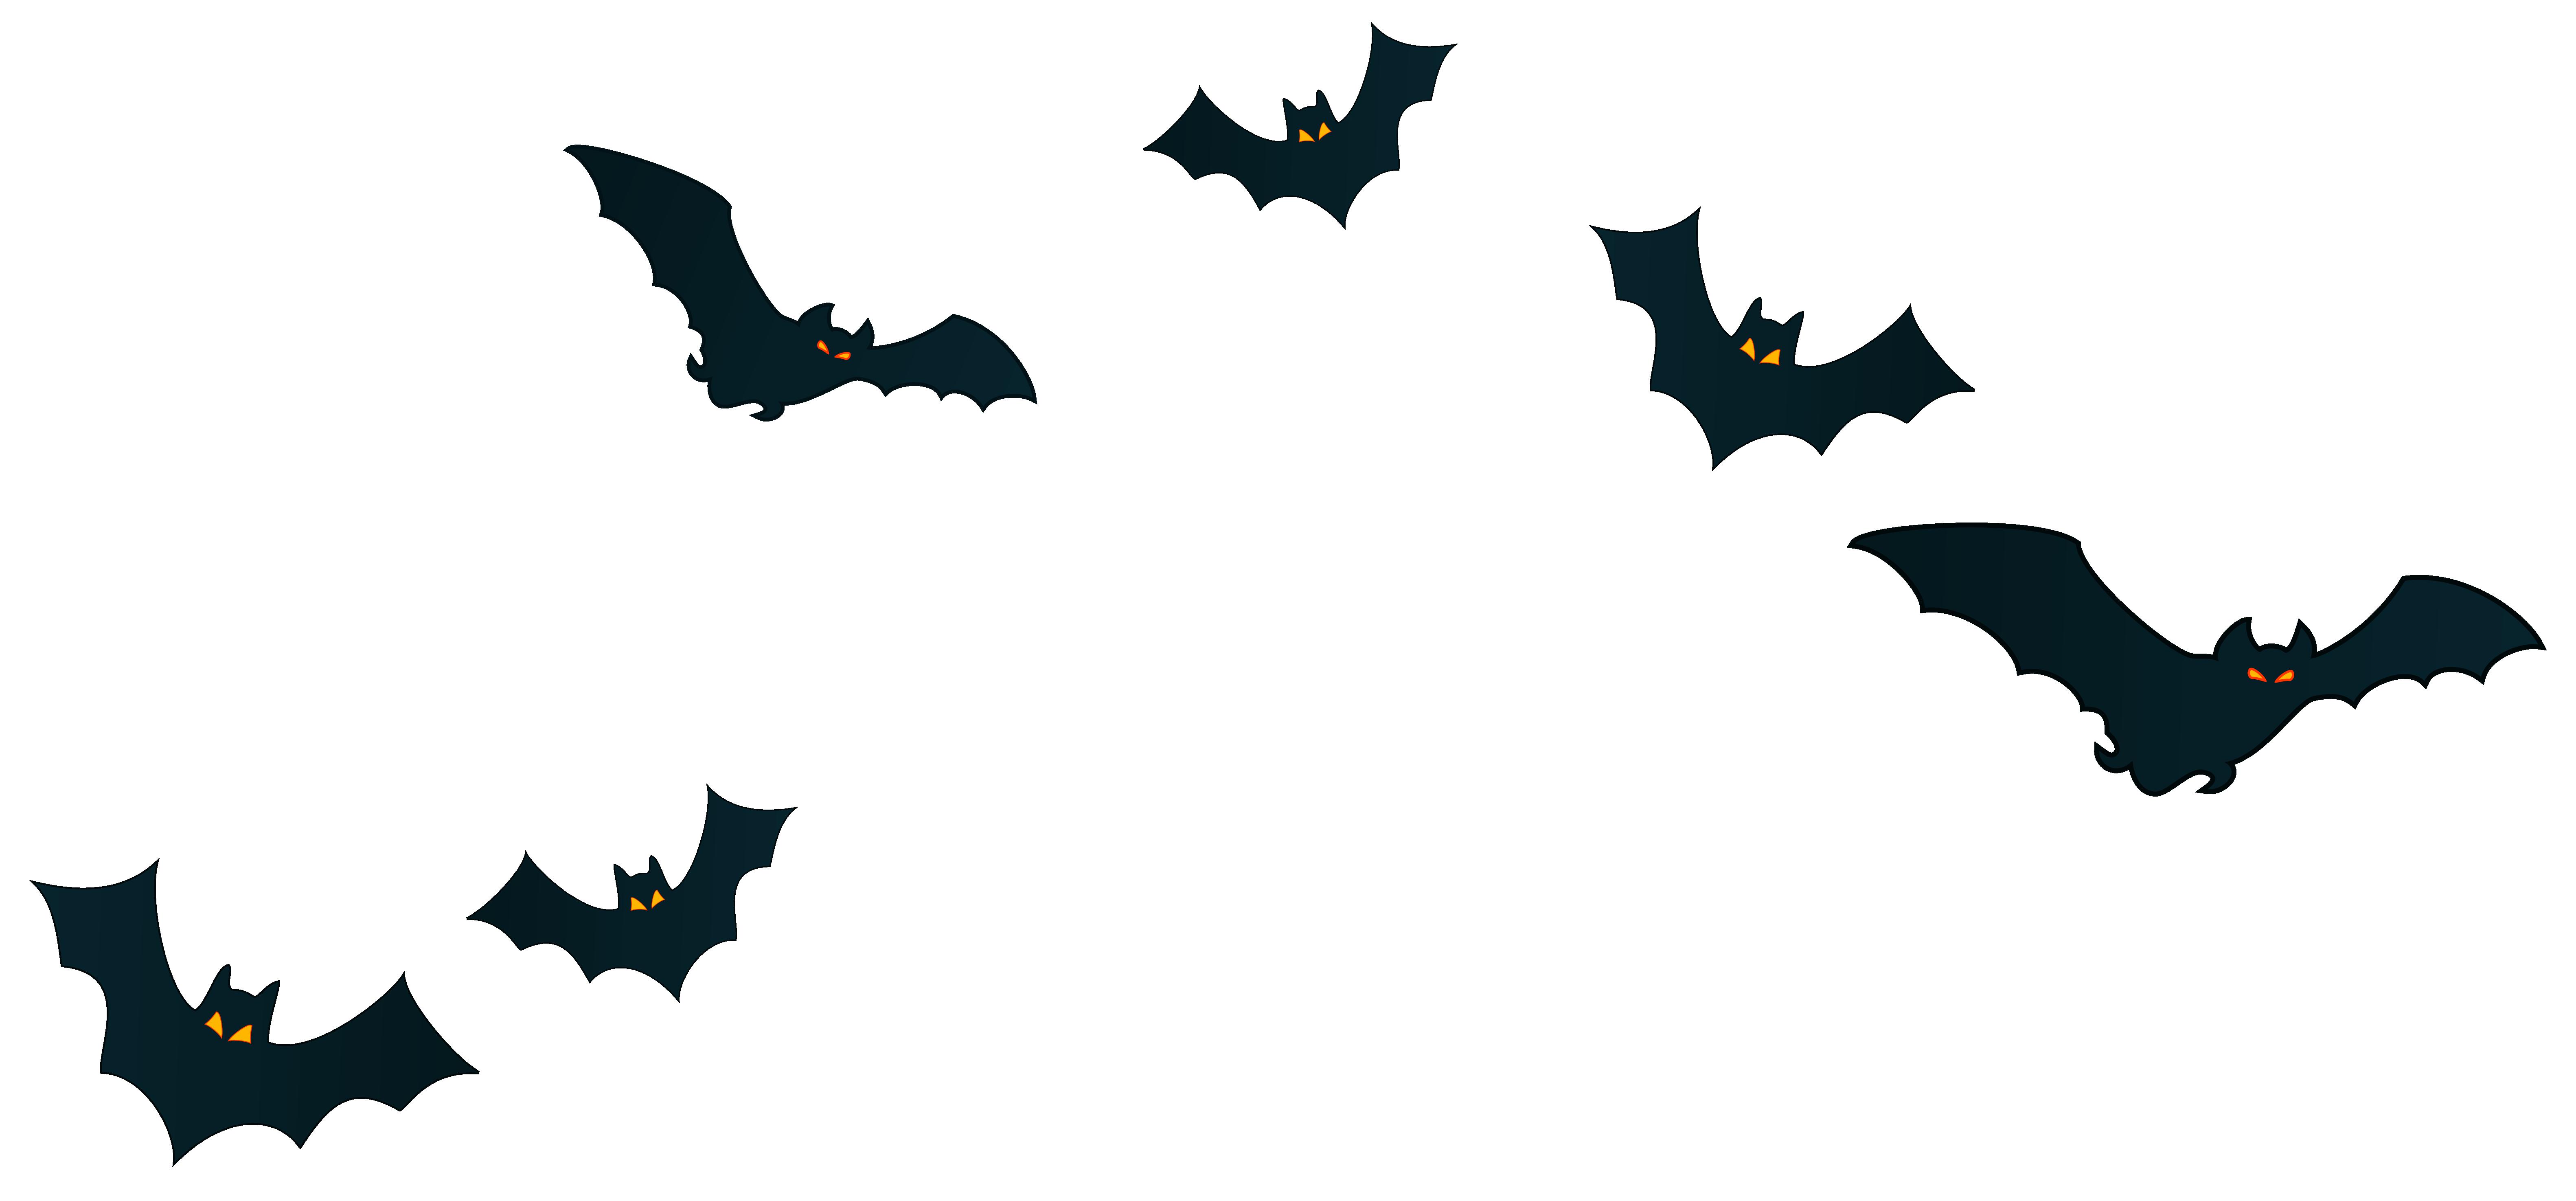 Halloween Bats Decor PNG Clipart Image.